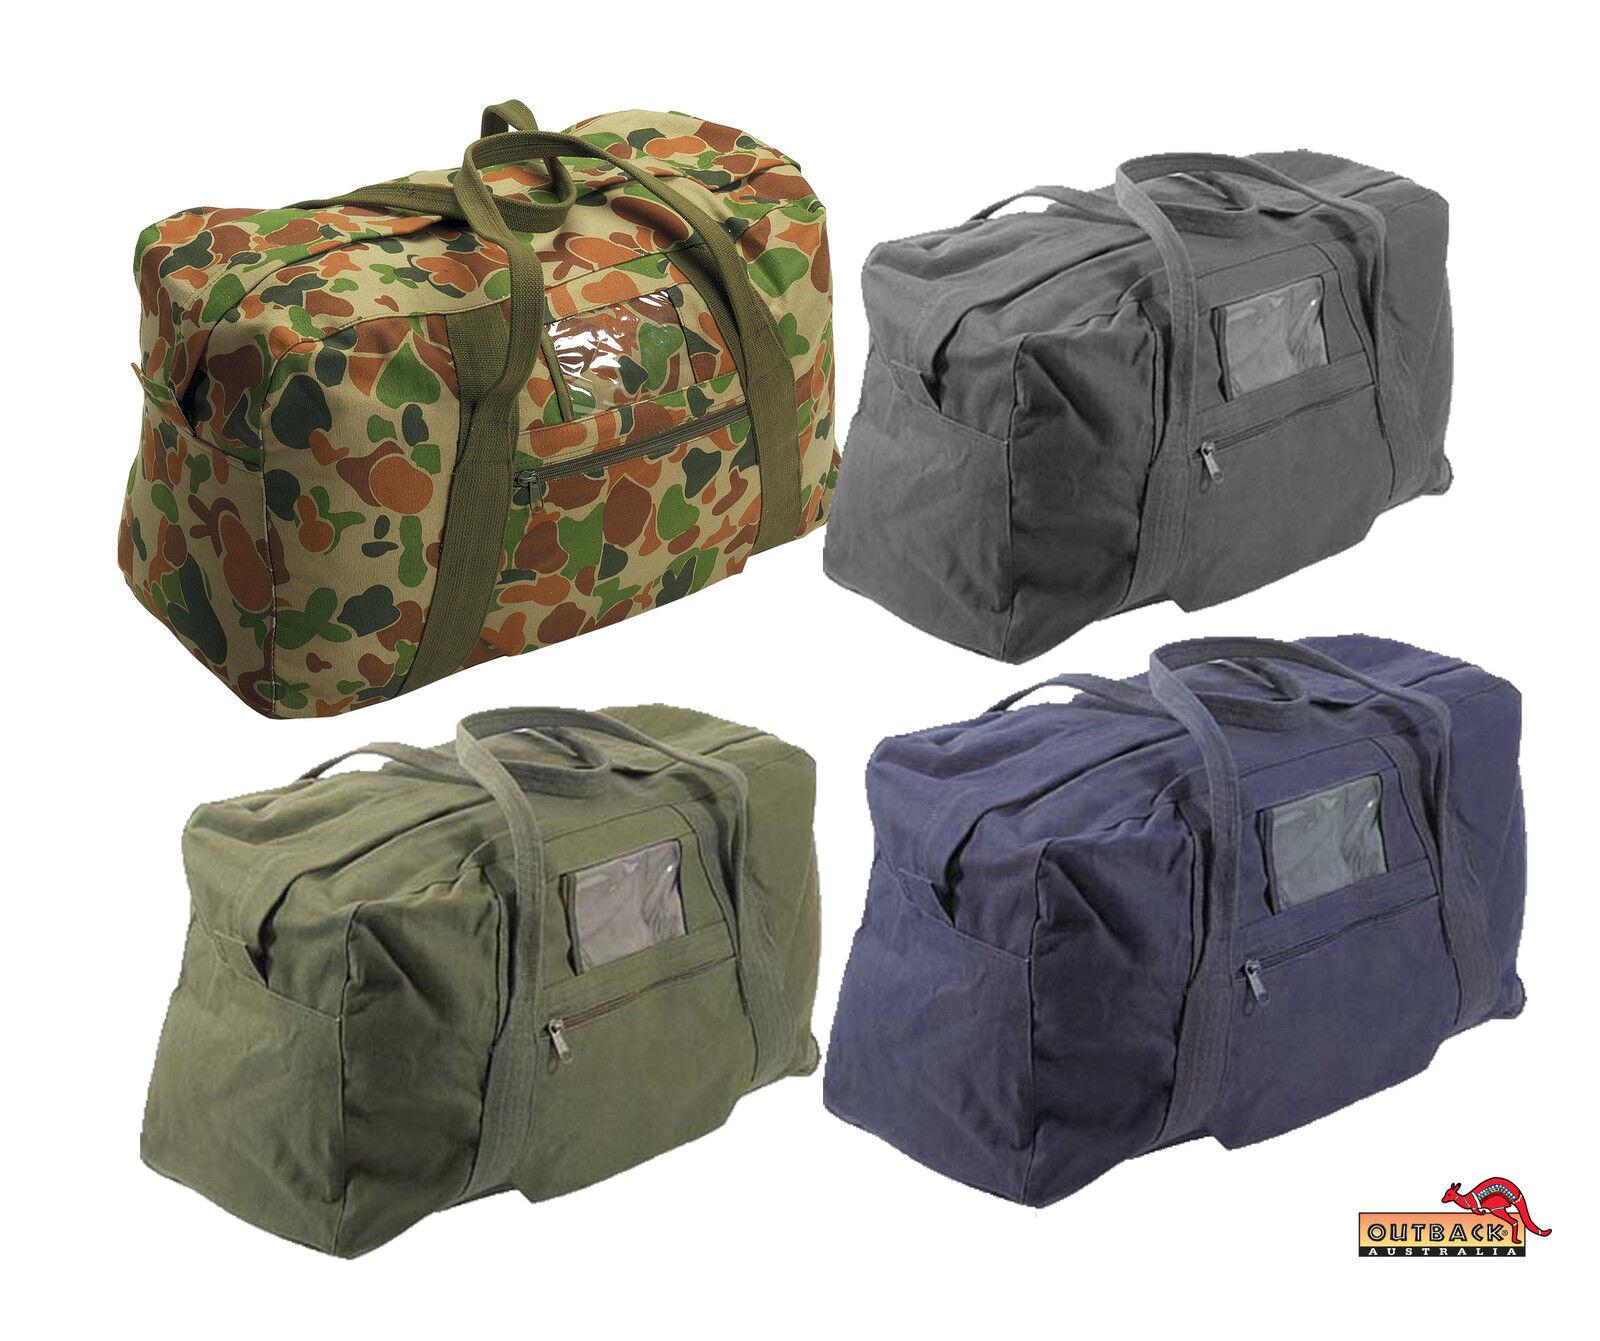 4dbf49c474 Details about Super Heavy Duty Canvas Army Echelon Bag 26